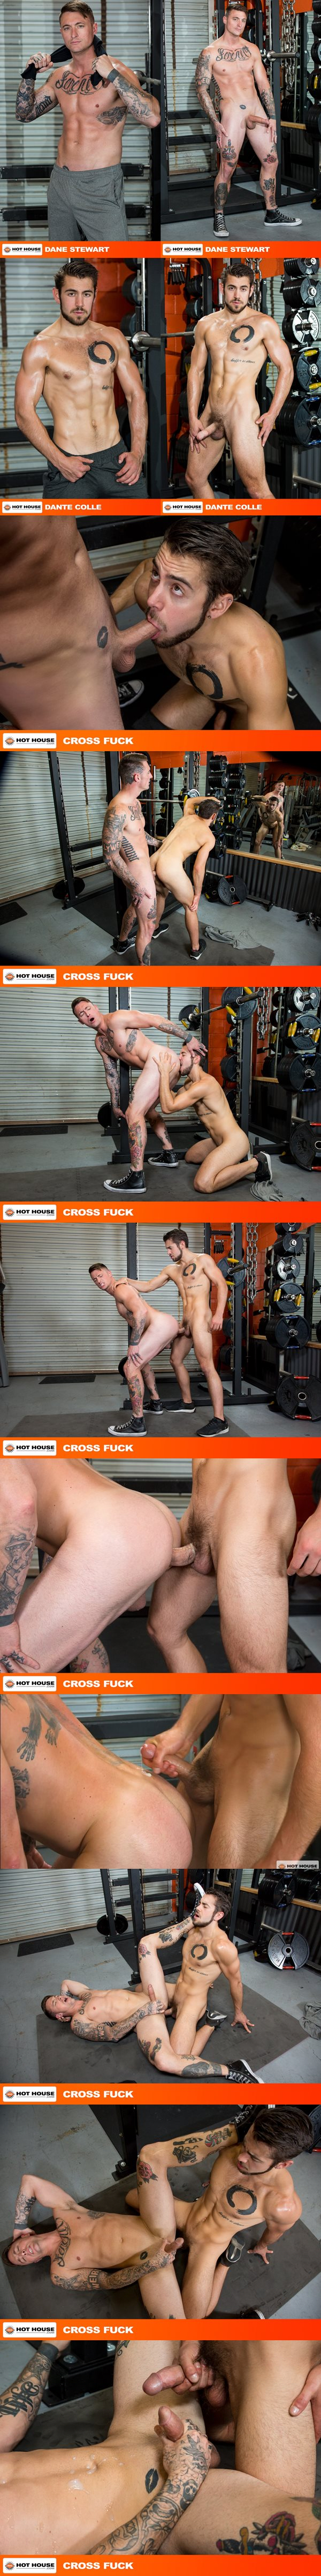 Inked muscle hunk Dane Stewart flip fucks Dante Colle at Hothouse 02